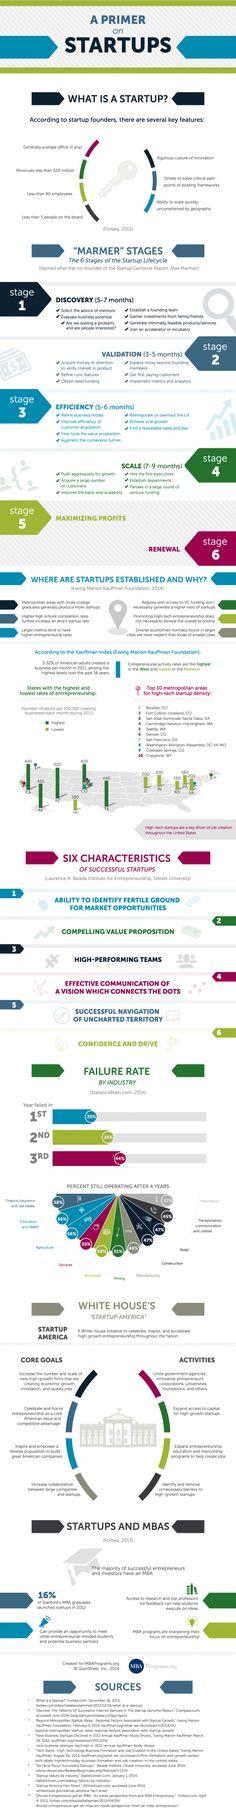 A primer on start-ups [infographic]